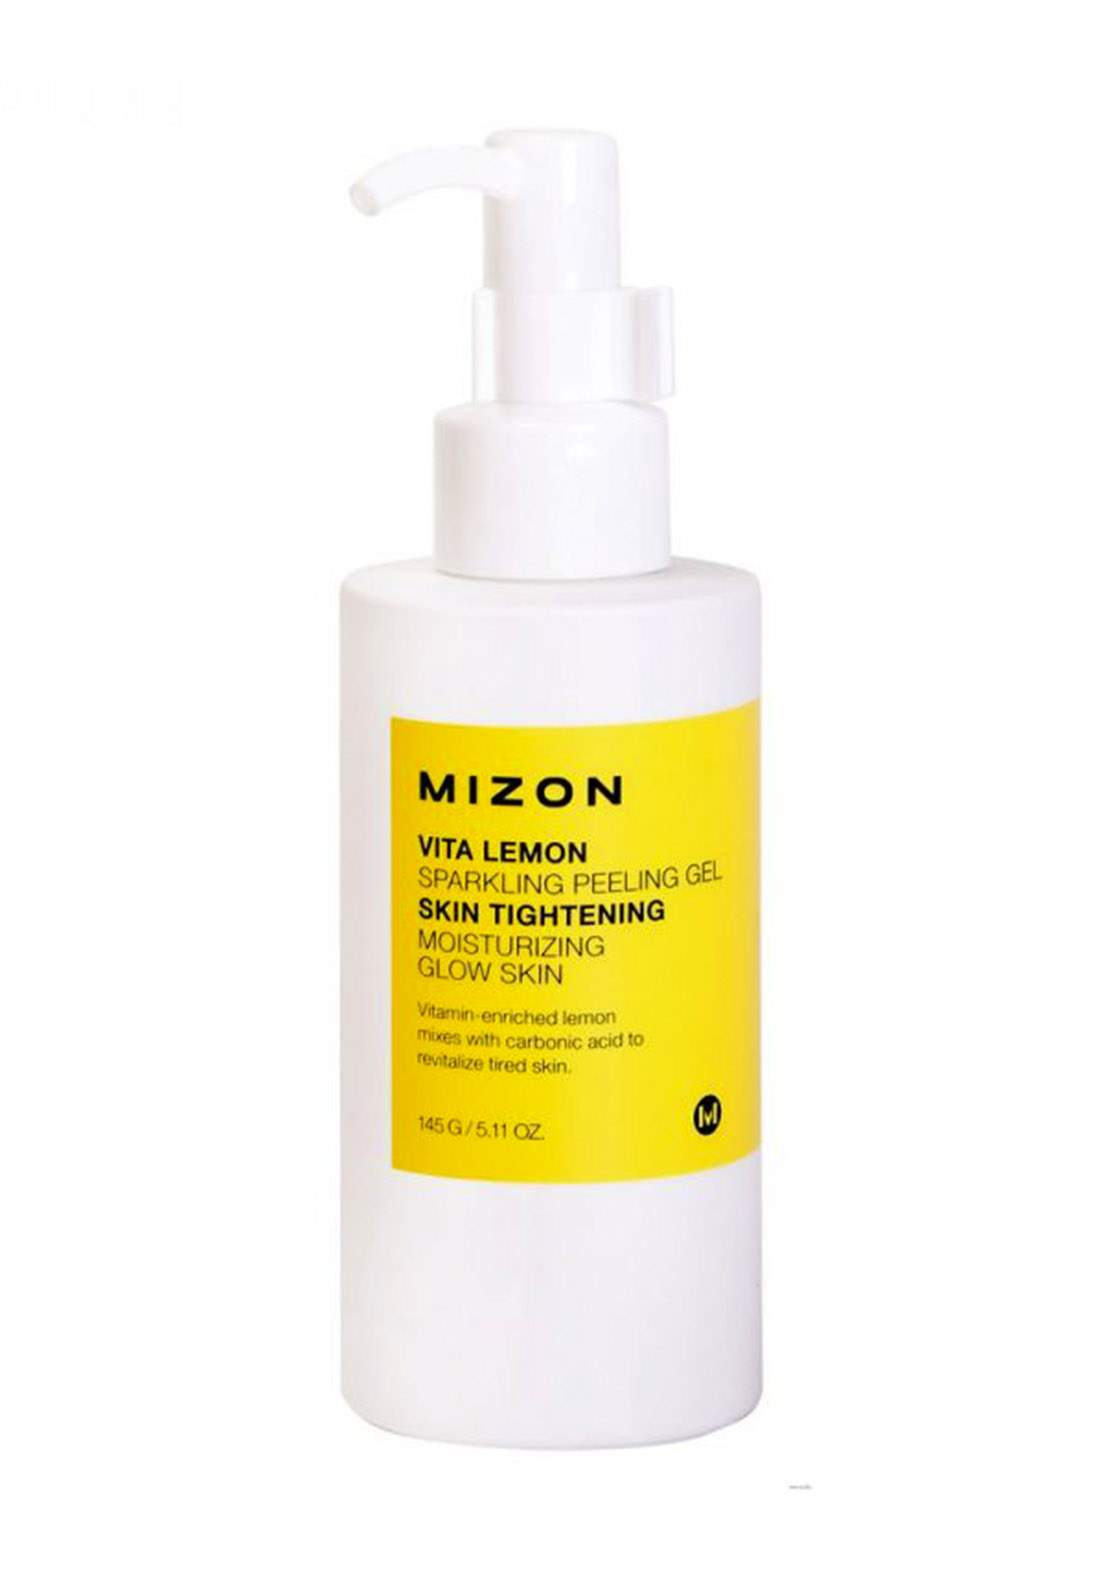 Mizon Vita Lemon Sparkling Peeling Gel 150g جل التقشير